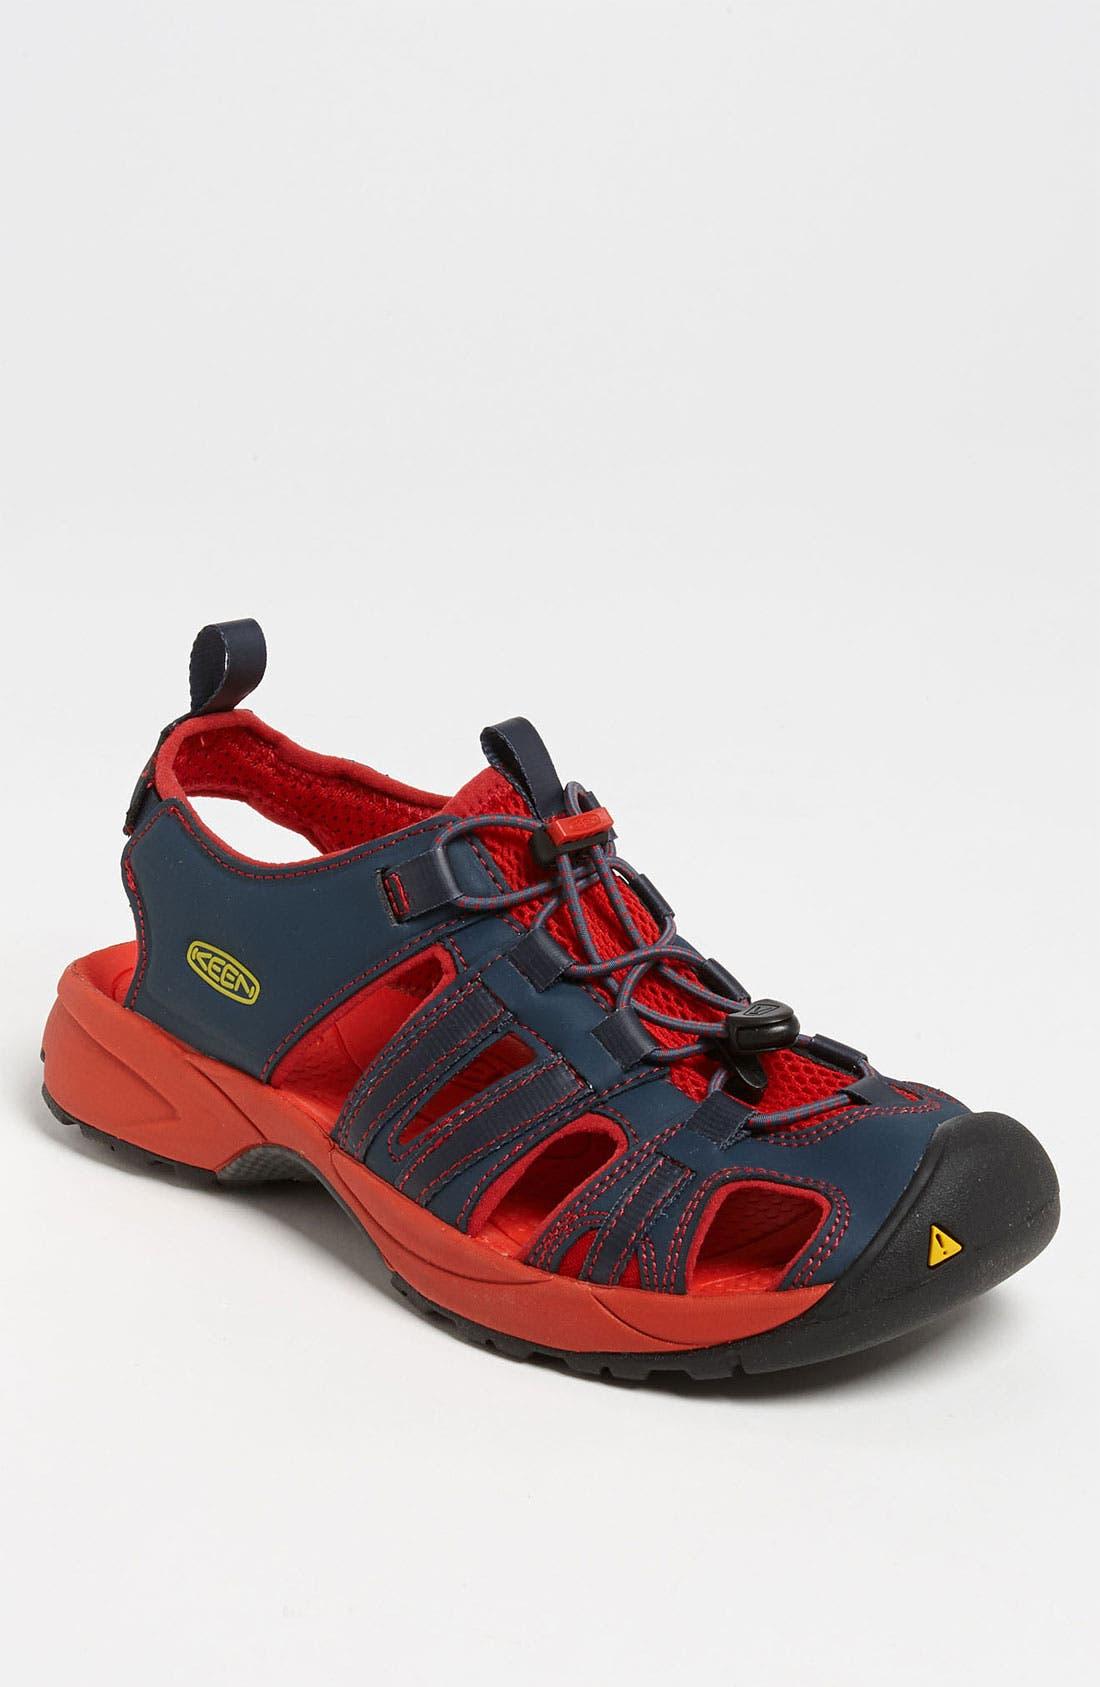 Alternate Image 1 Selected - Keen 'Turia' Sandal (Men)